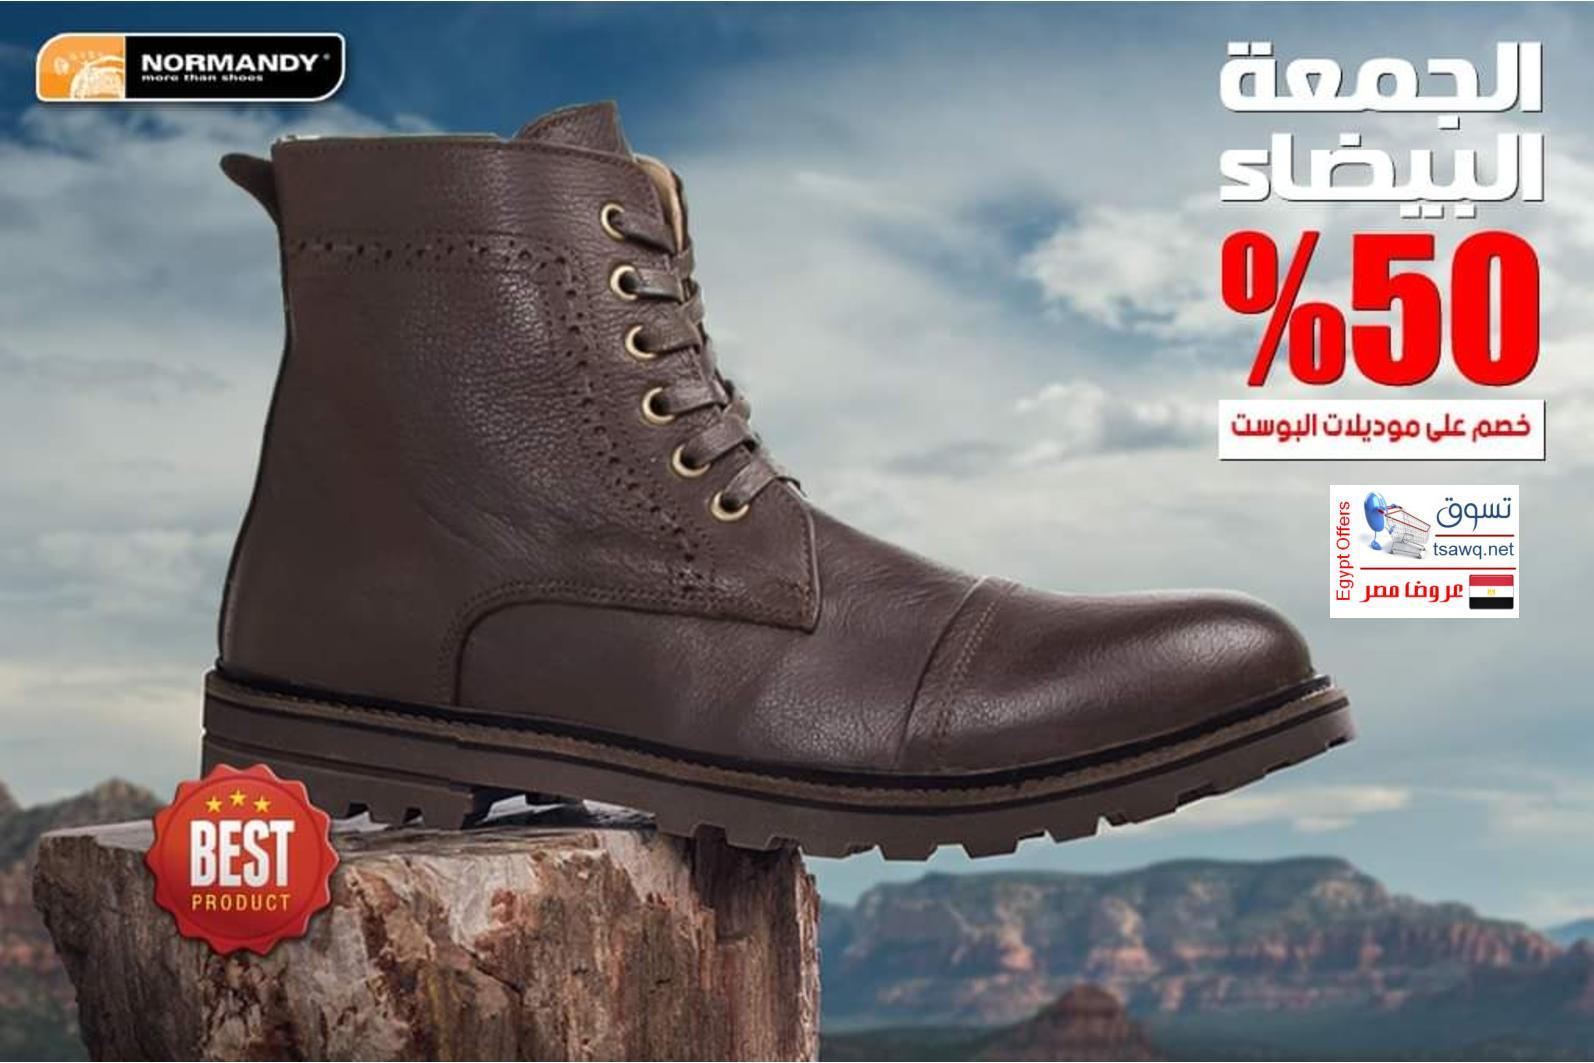 Calameo Tsawq Net Normandy Shoes Egypt 04 11 2020 01